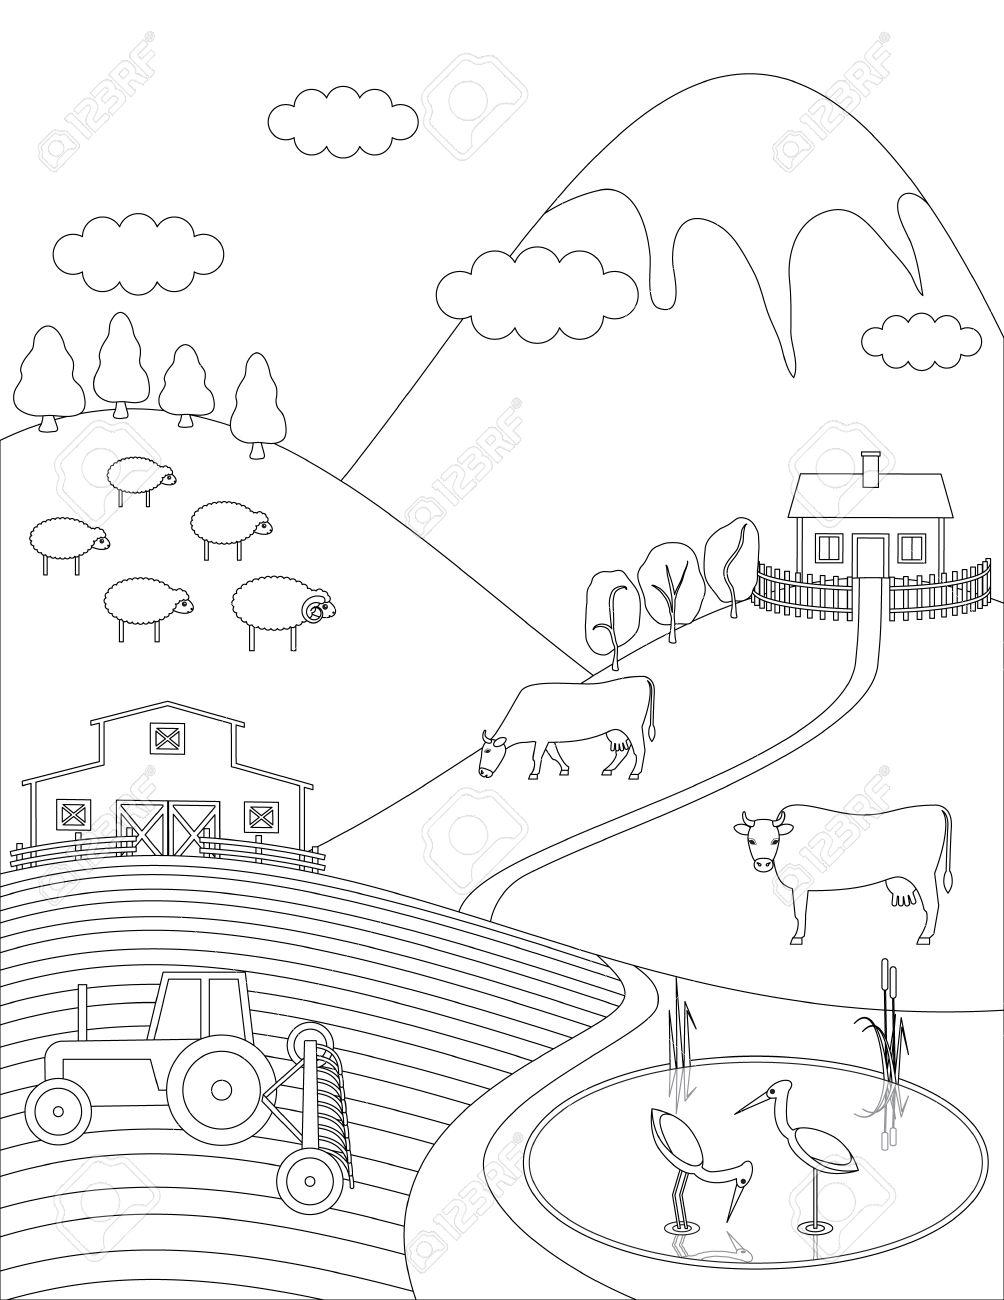 Dibujo Para Colorear Campo Fondo Granja. Animales Aves árboles Lago ...